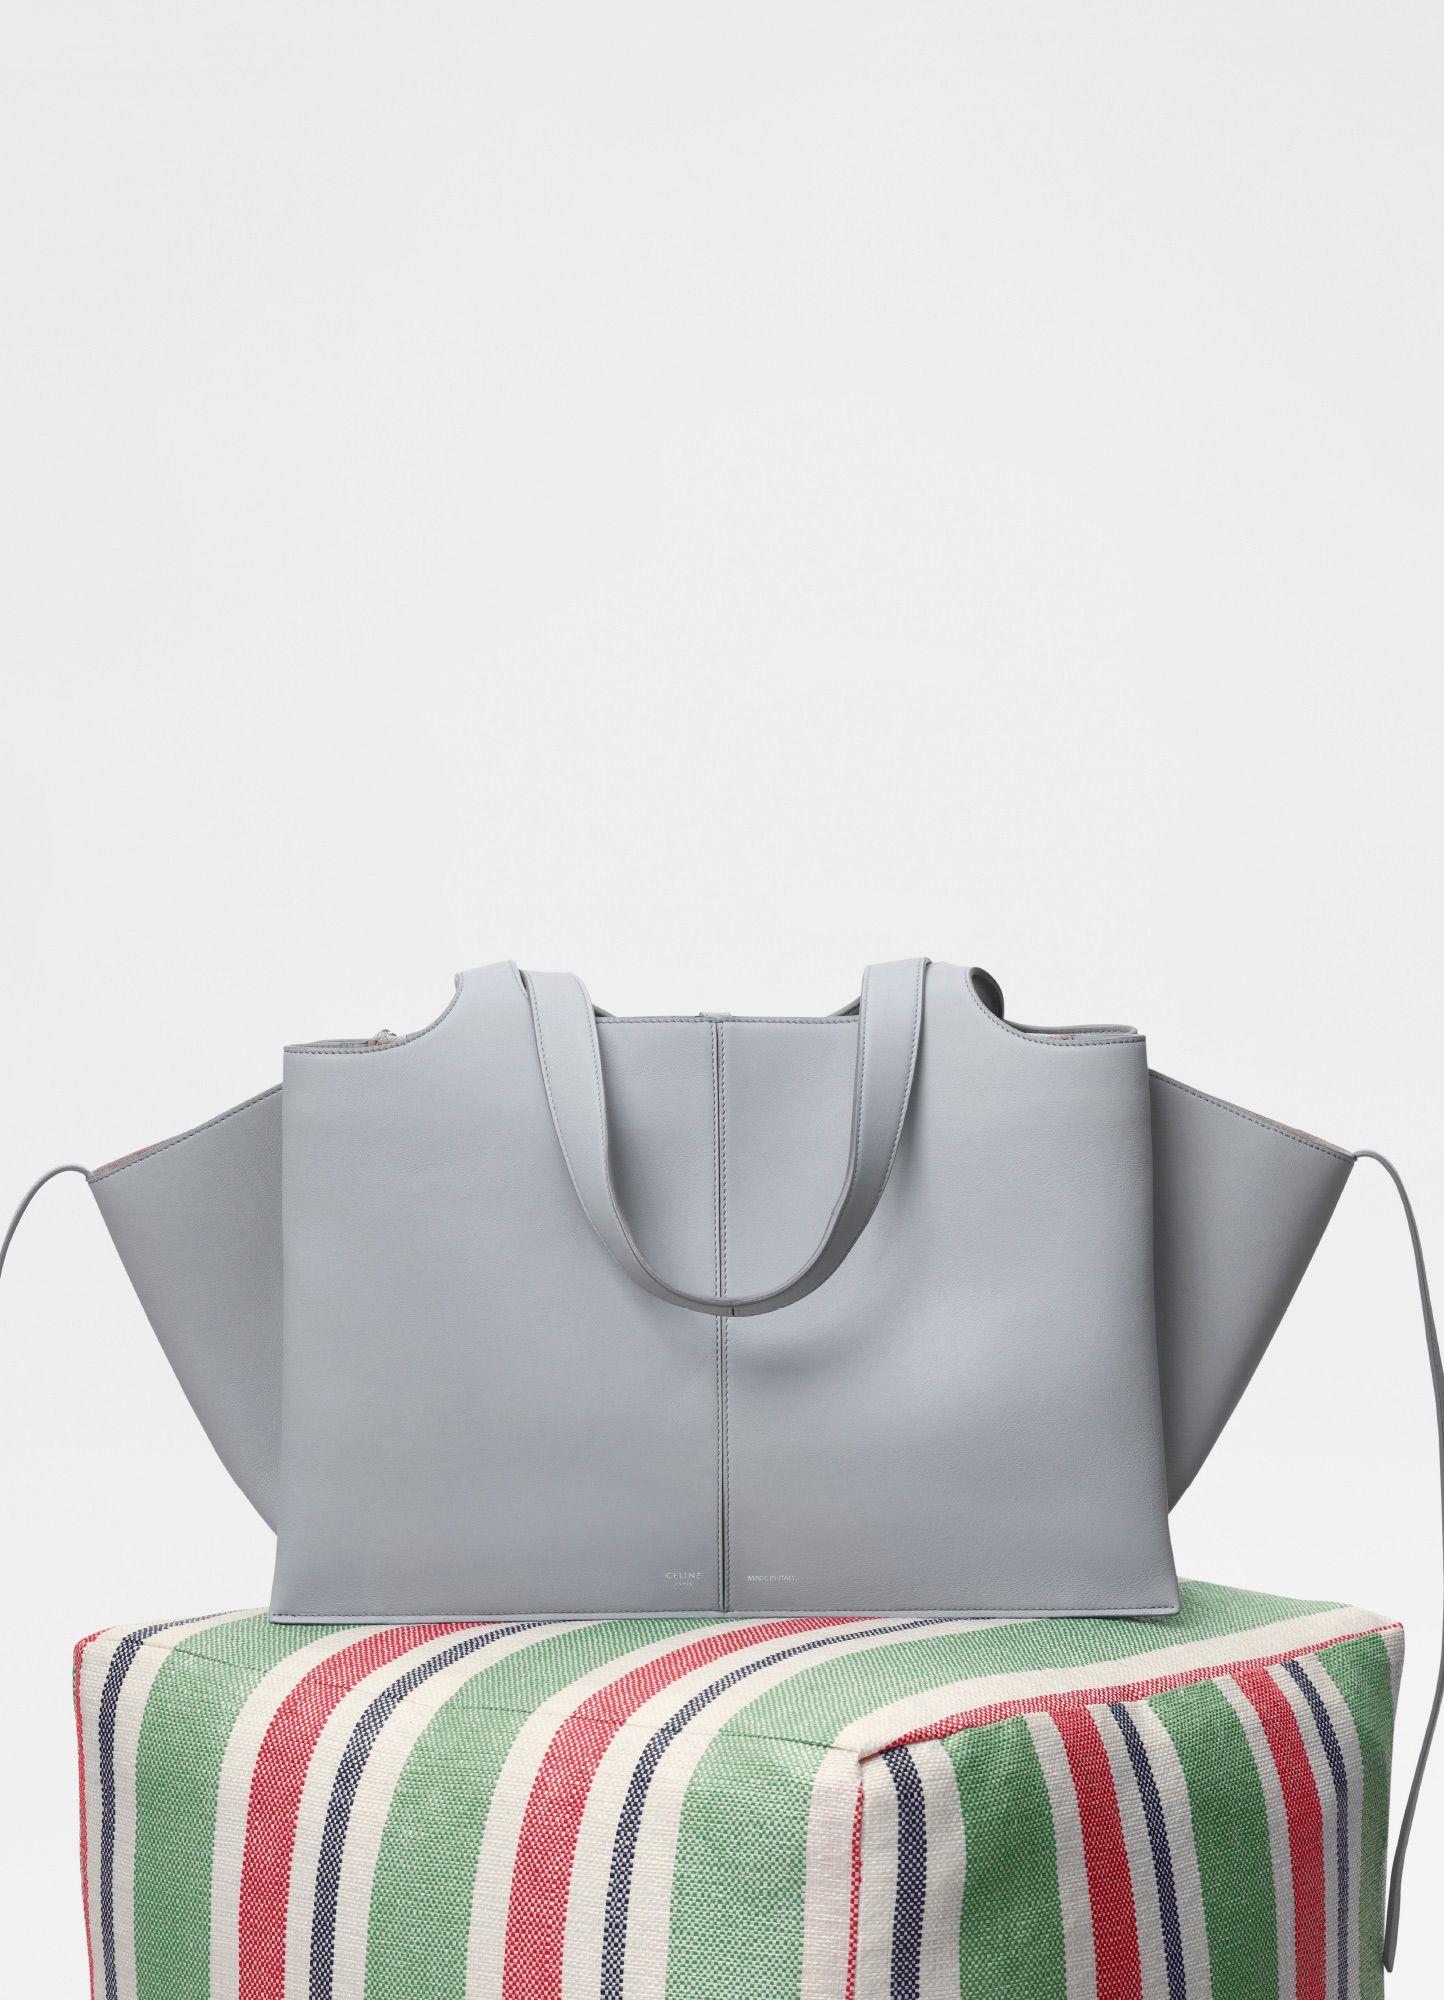 65f877548bcd Medium Tri-Fold bag in supple natural calfskin - Handbags   CÉLINE ...